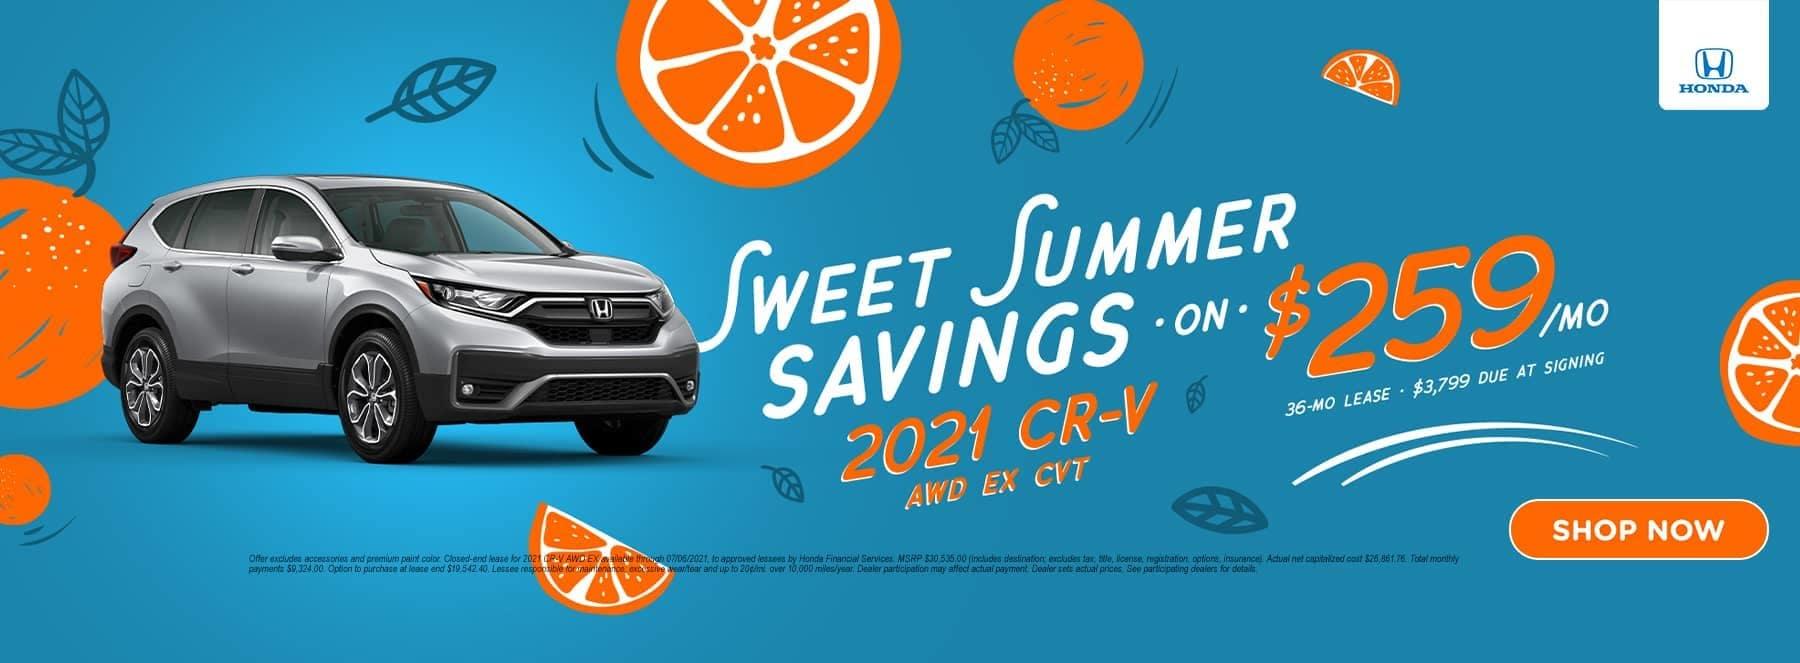 Sweet Summer Savings 2021 CR-V AWD EX CVT